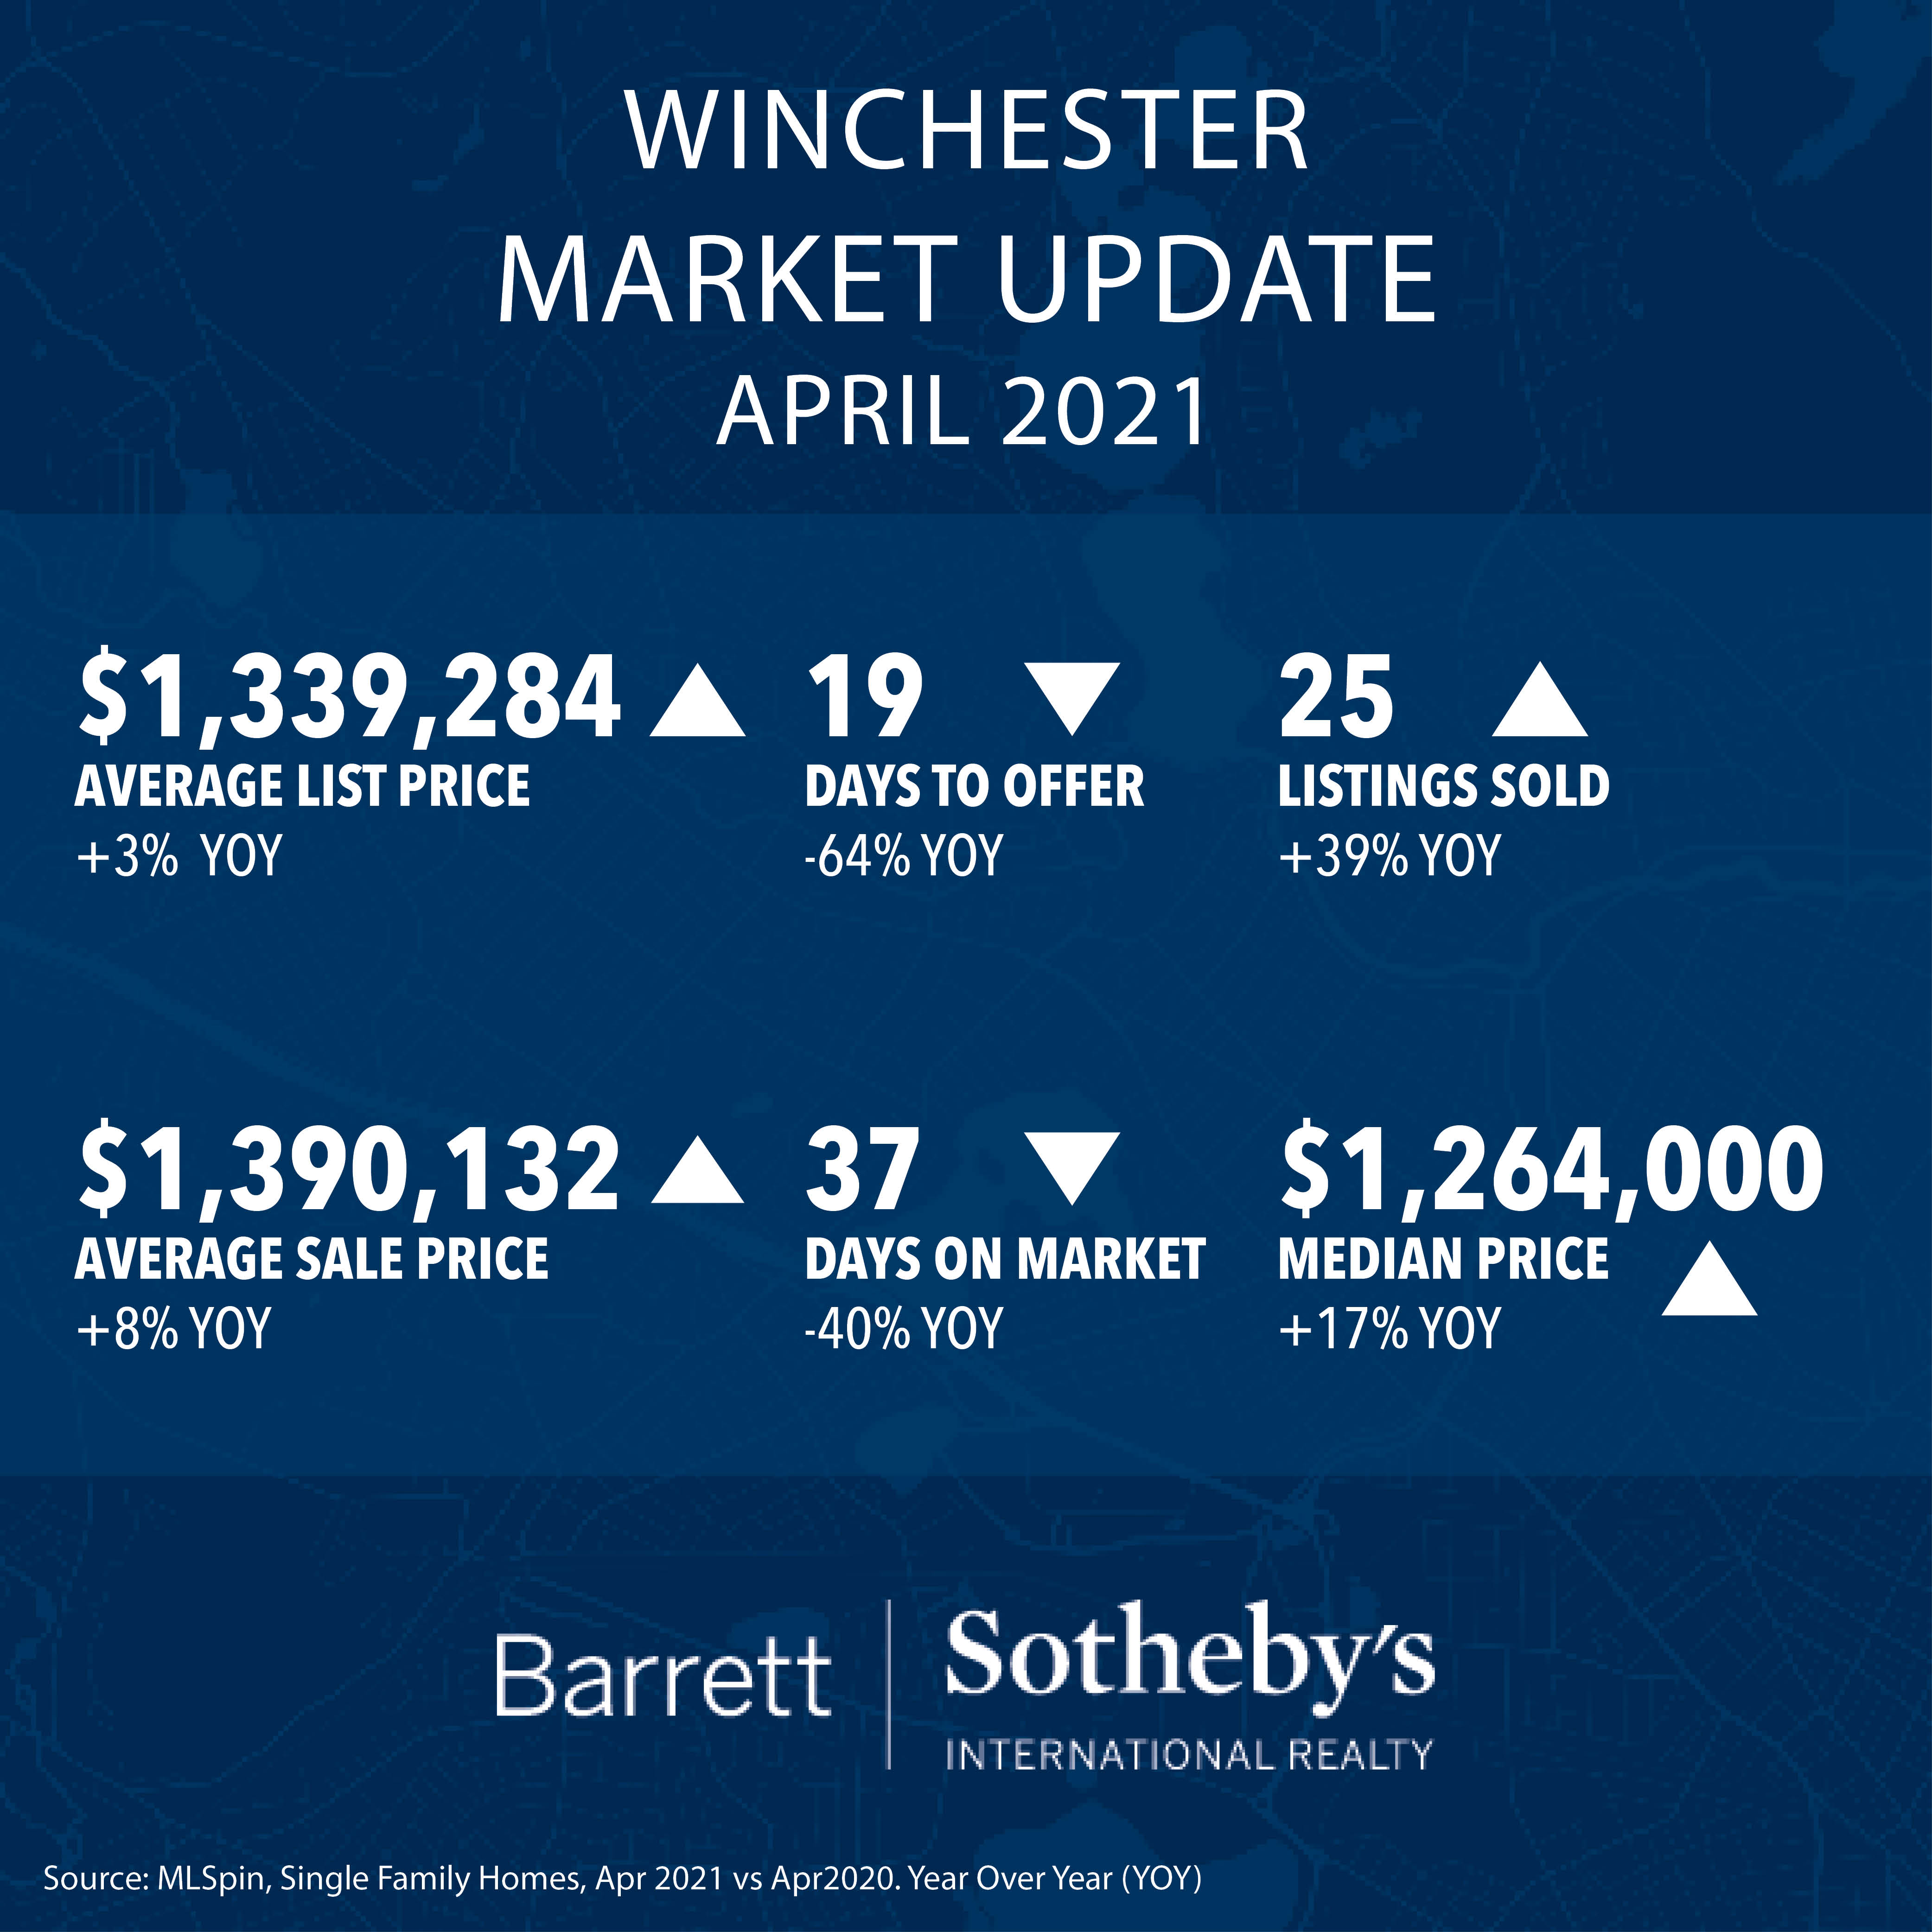 Winchester Real Estate Market Update